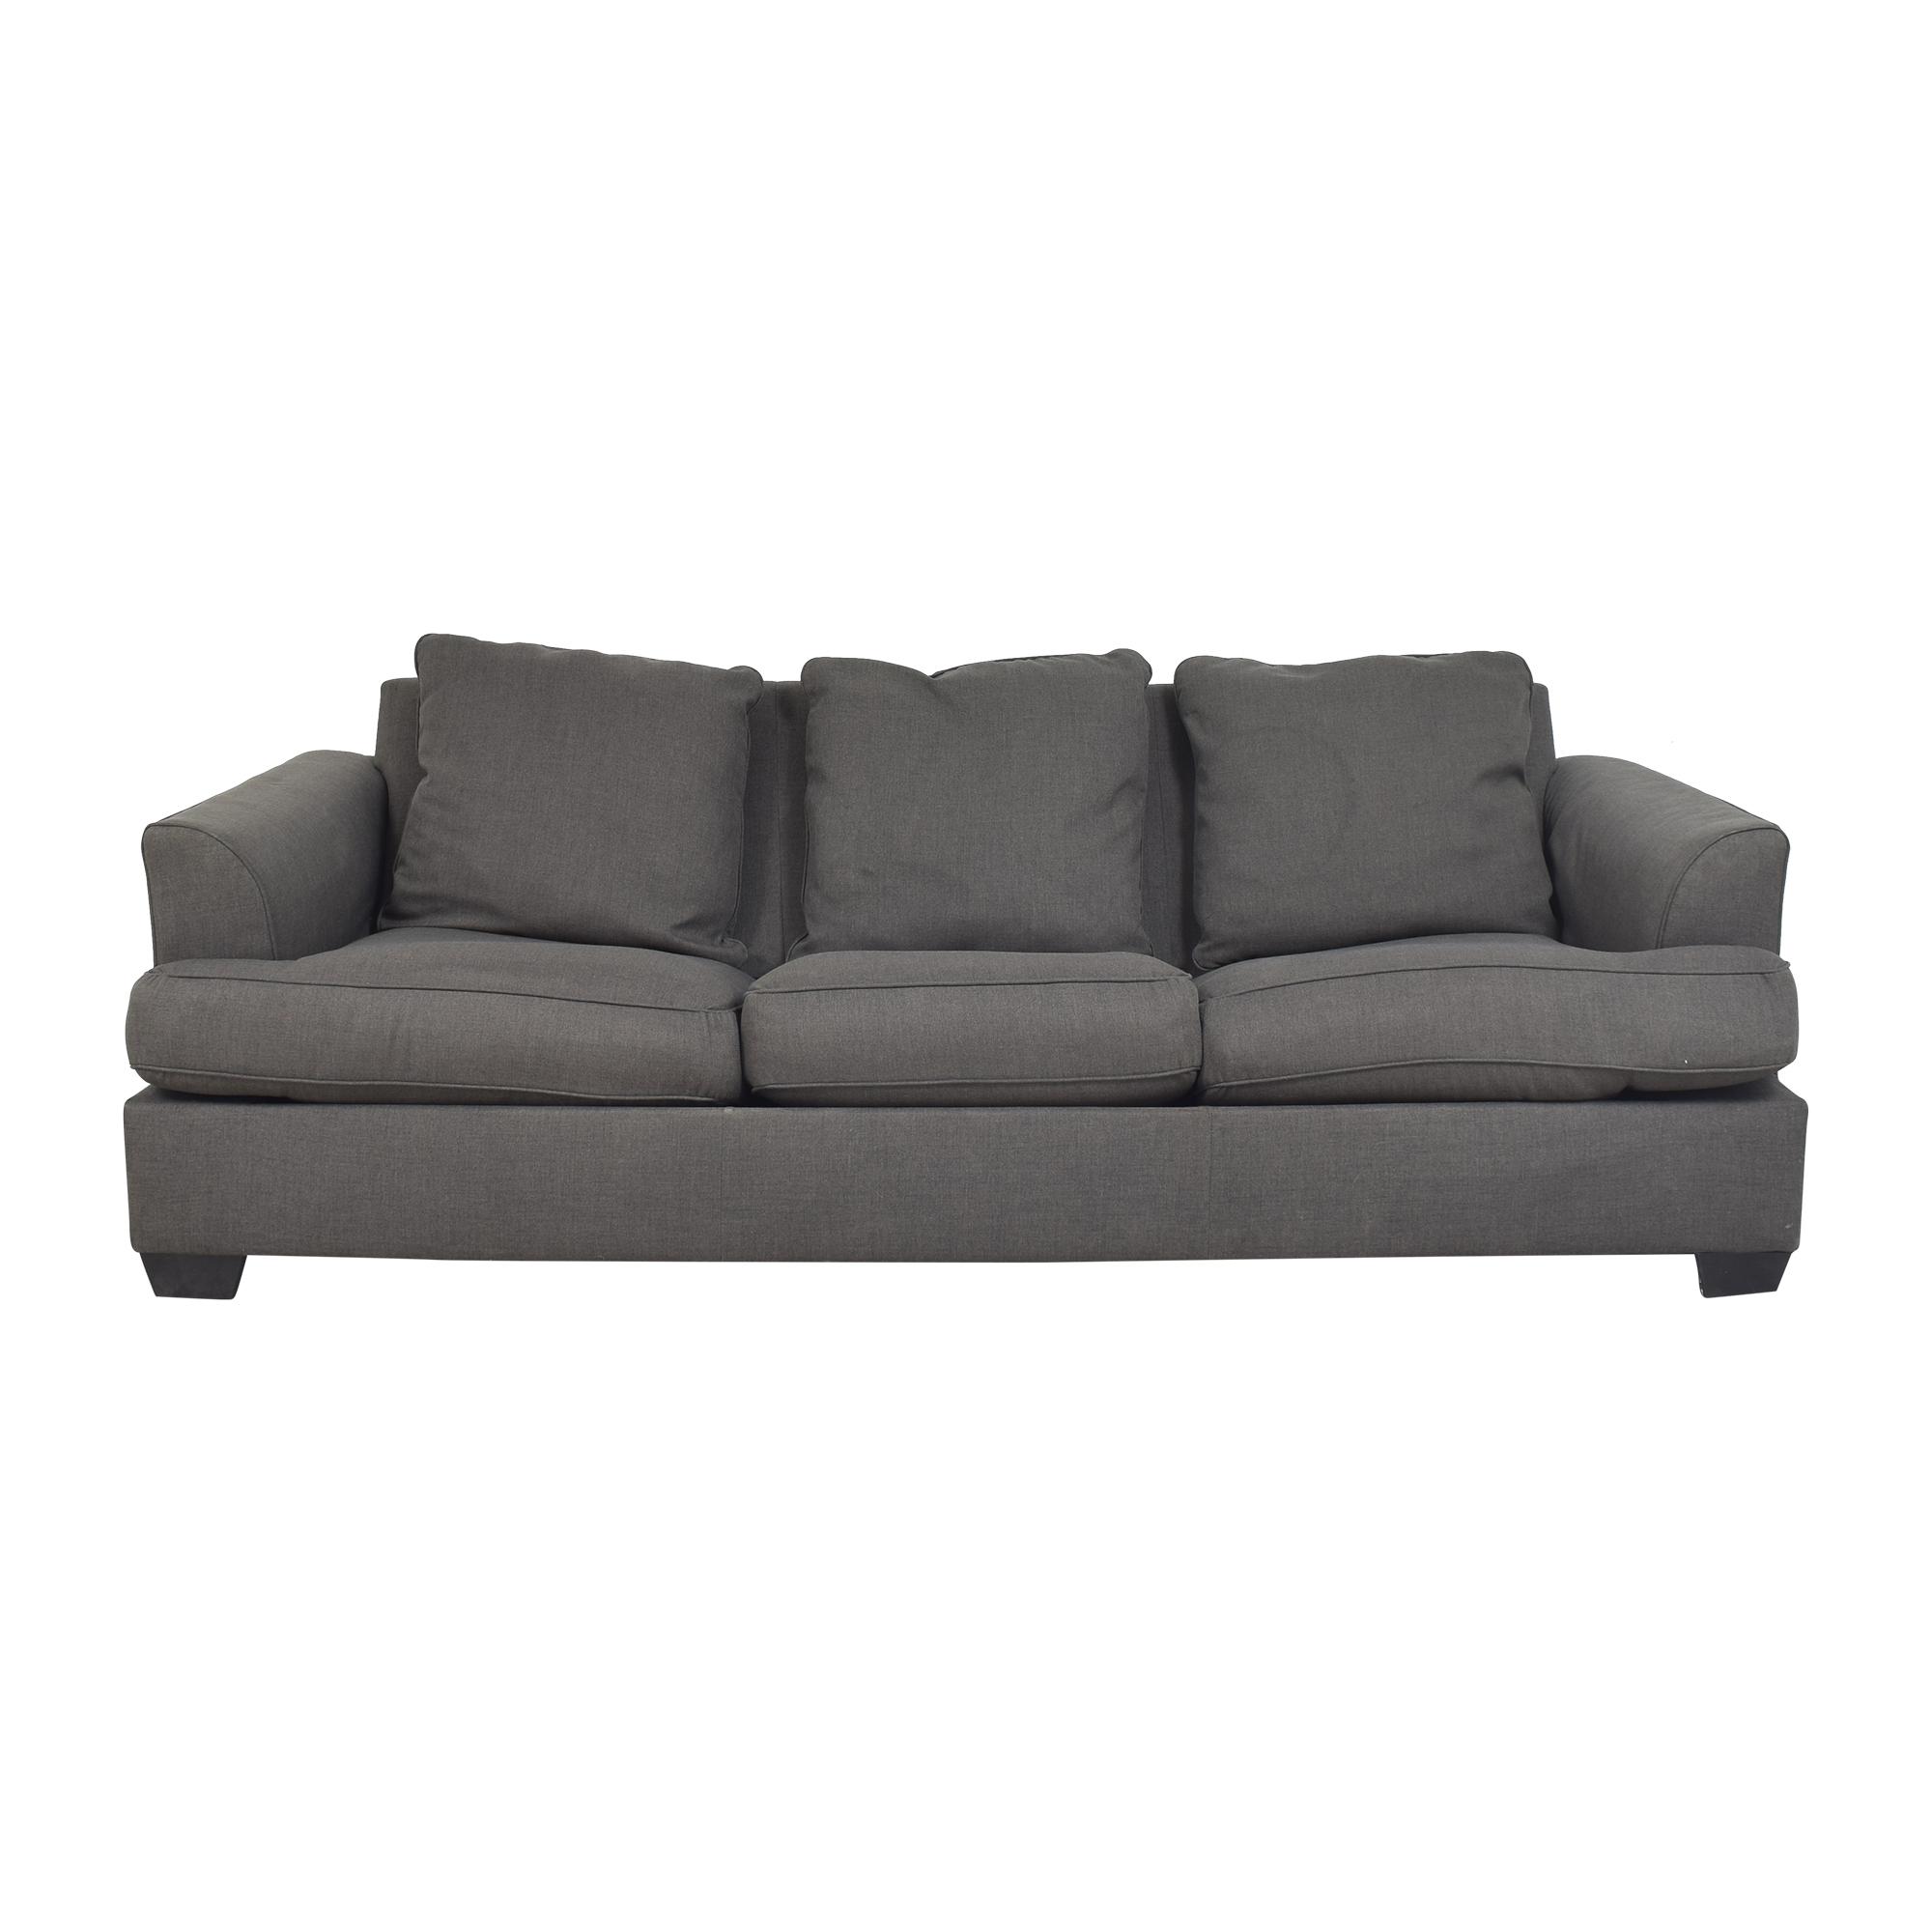 Three Cushion Sleeper Sofa coupon